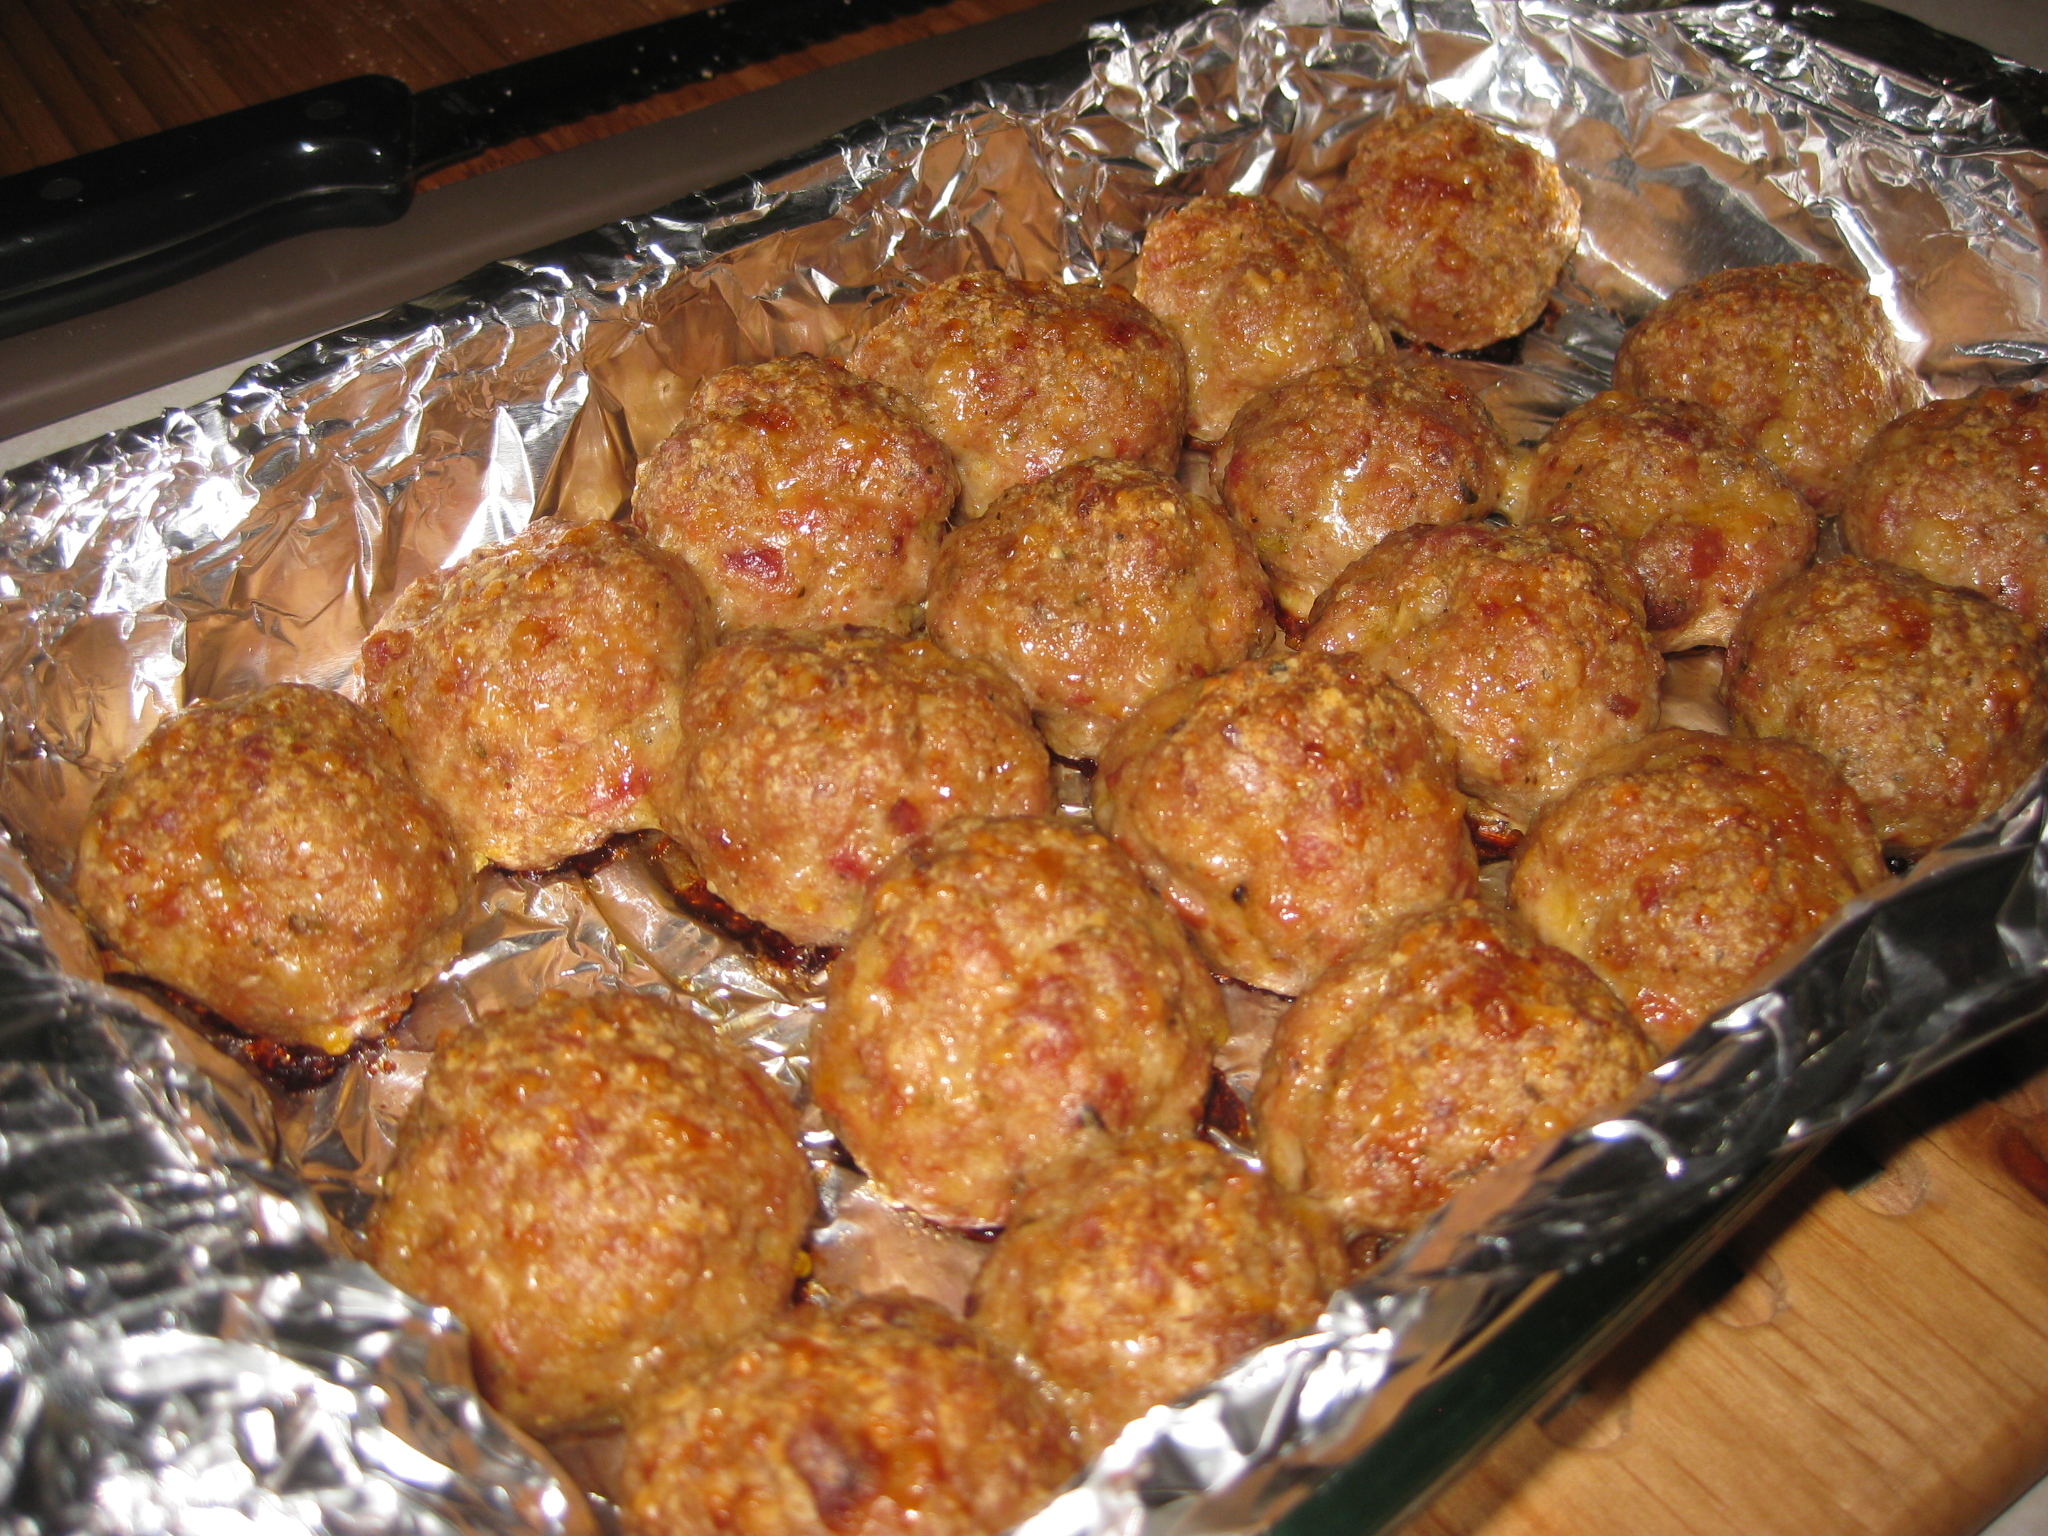 Turkey-Bacon Meatballs